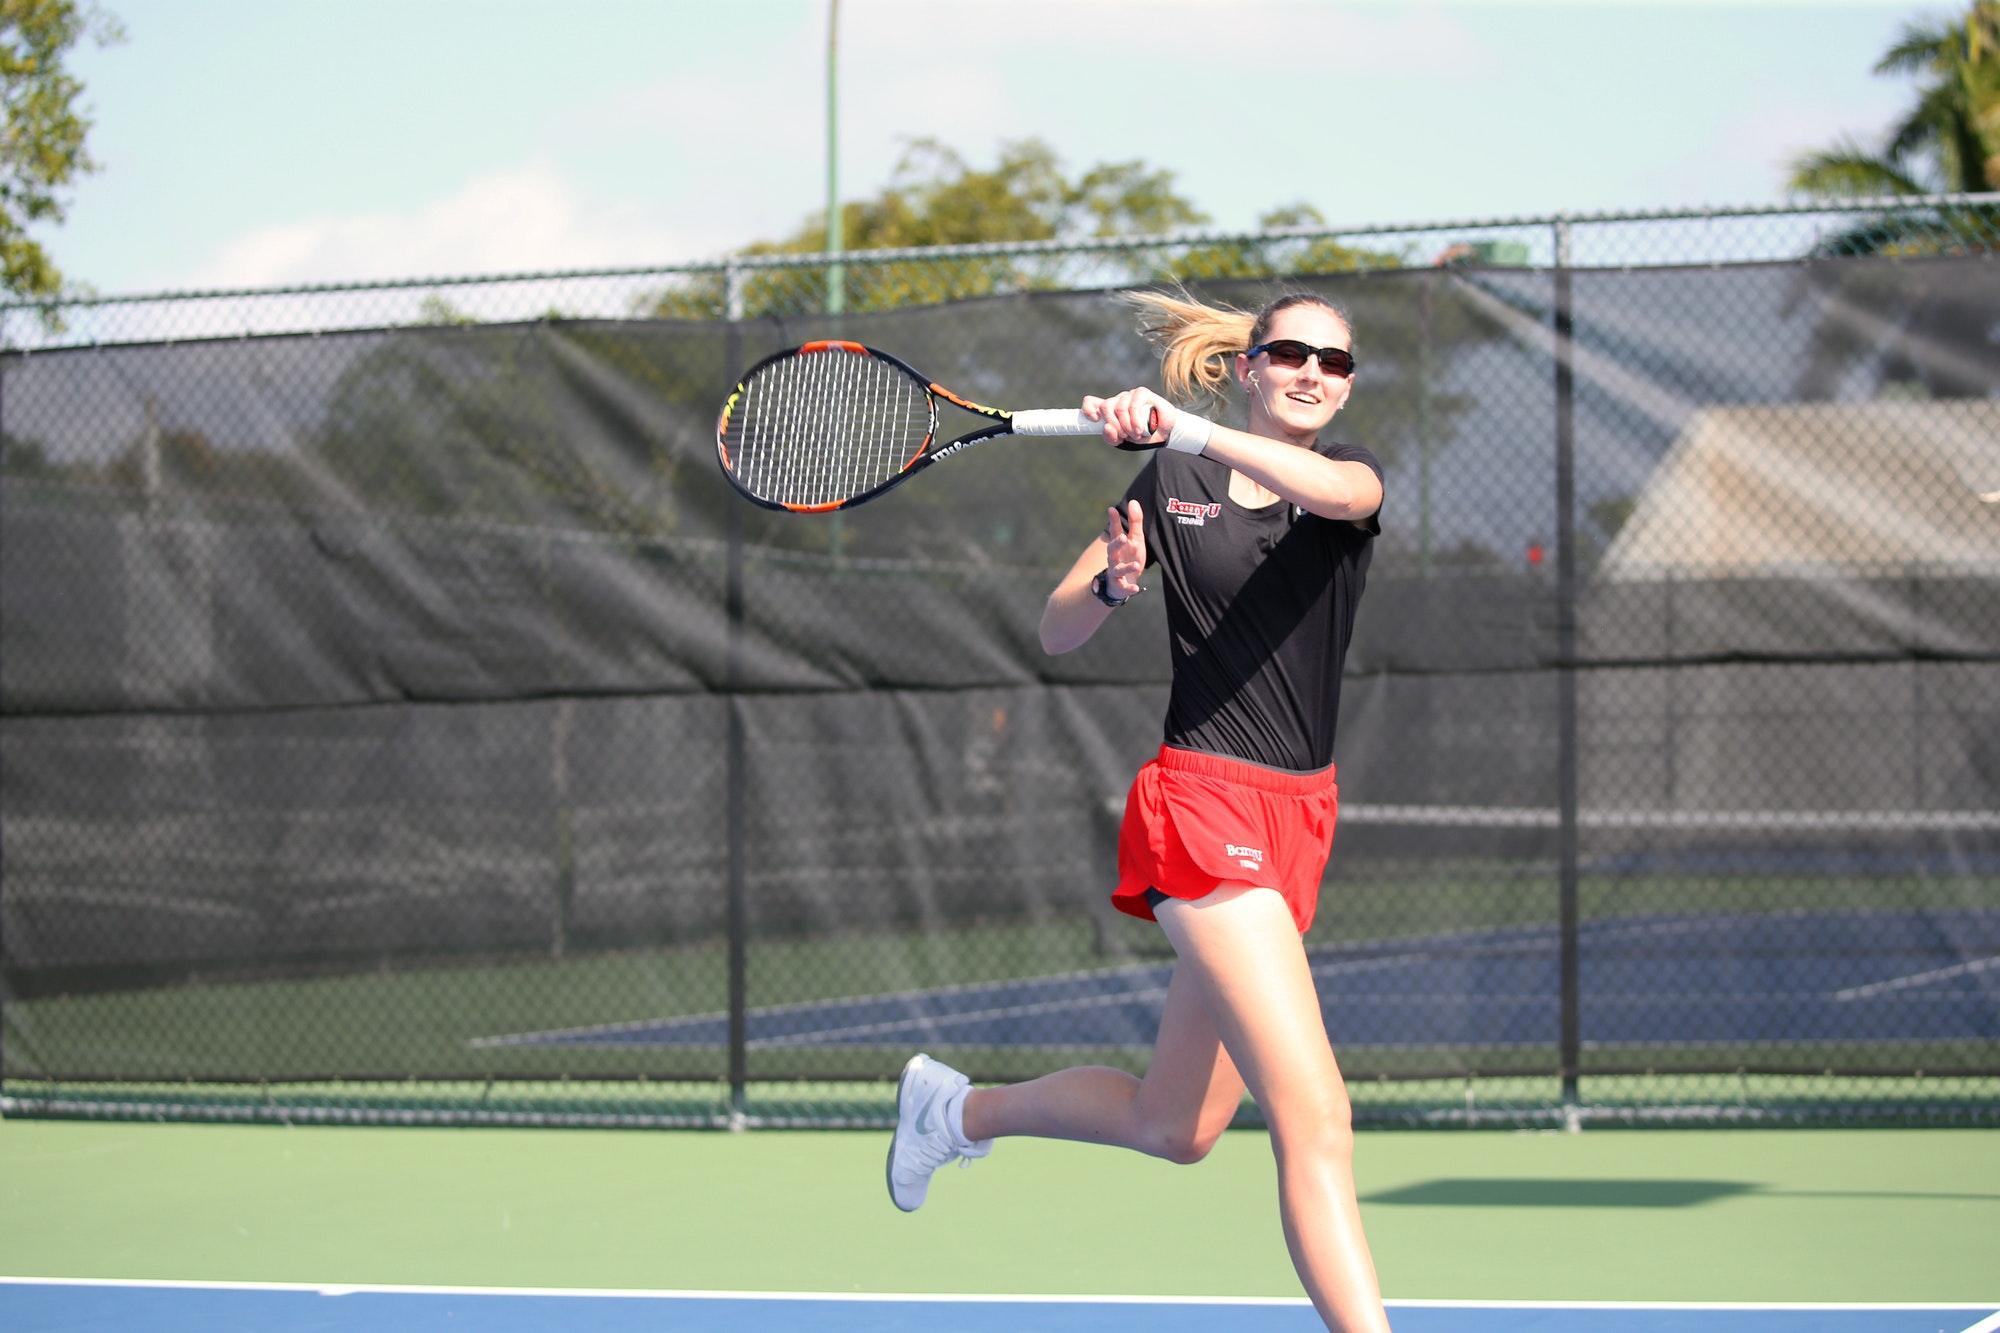 Zuzanna M. teaches tennis lessons in Orlando, FL